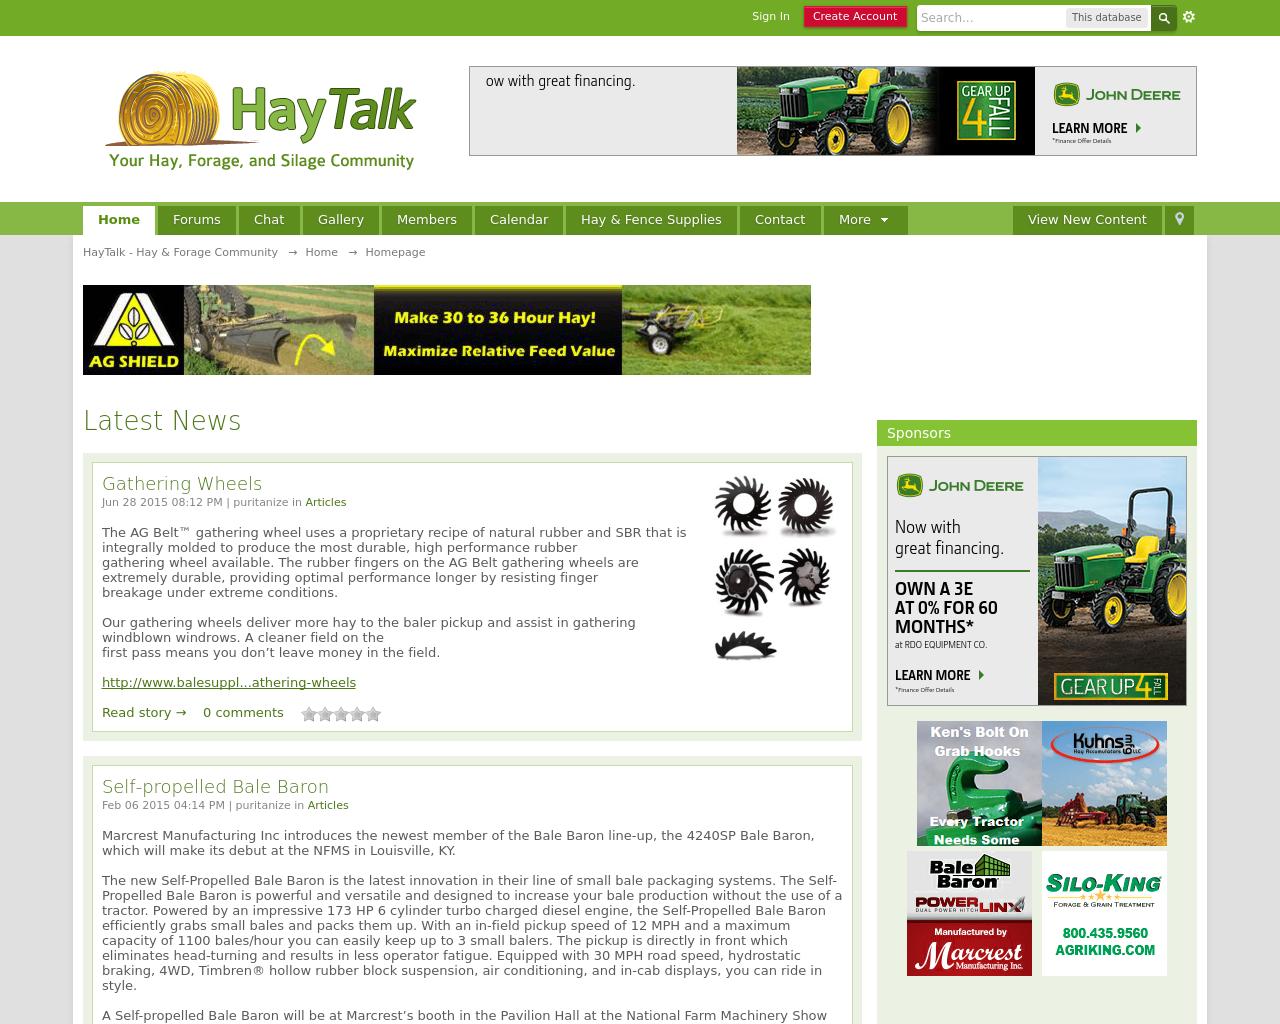 HayTalk-Advertising-Reviews-Pricing